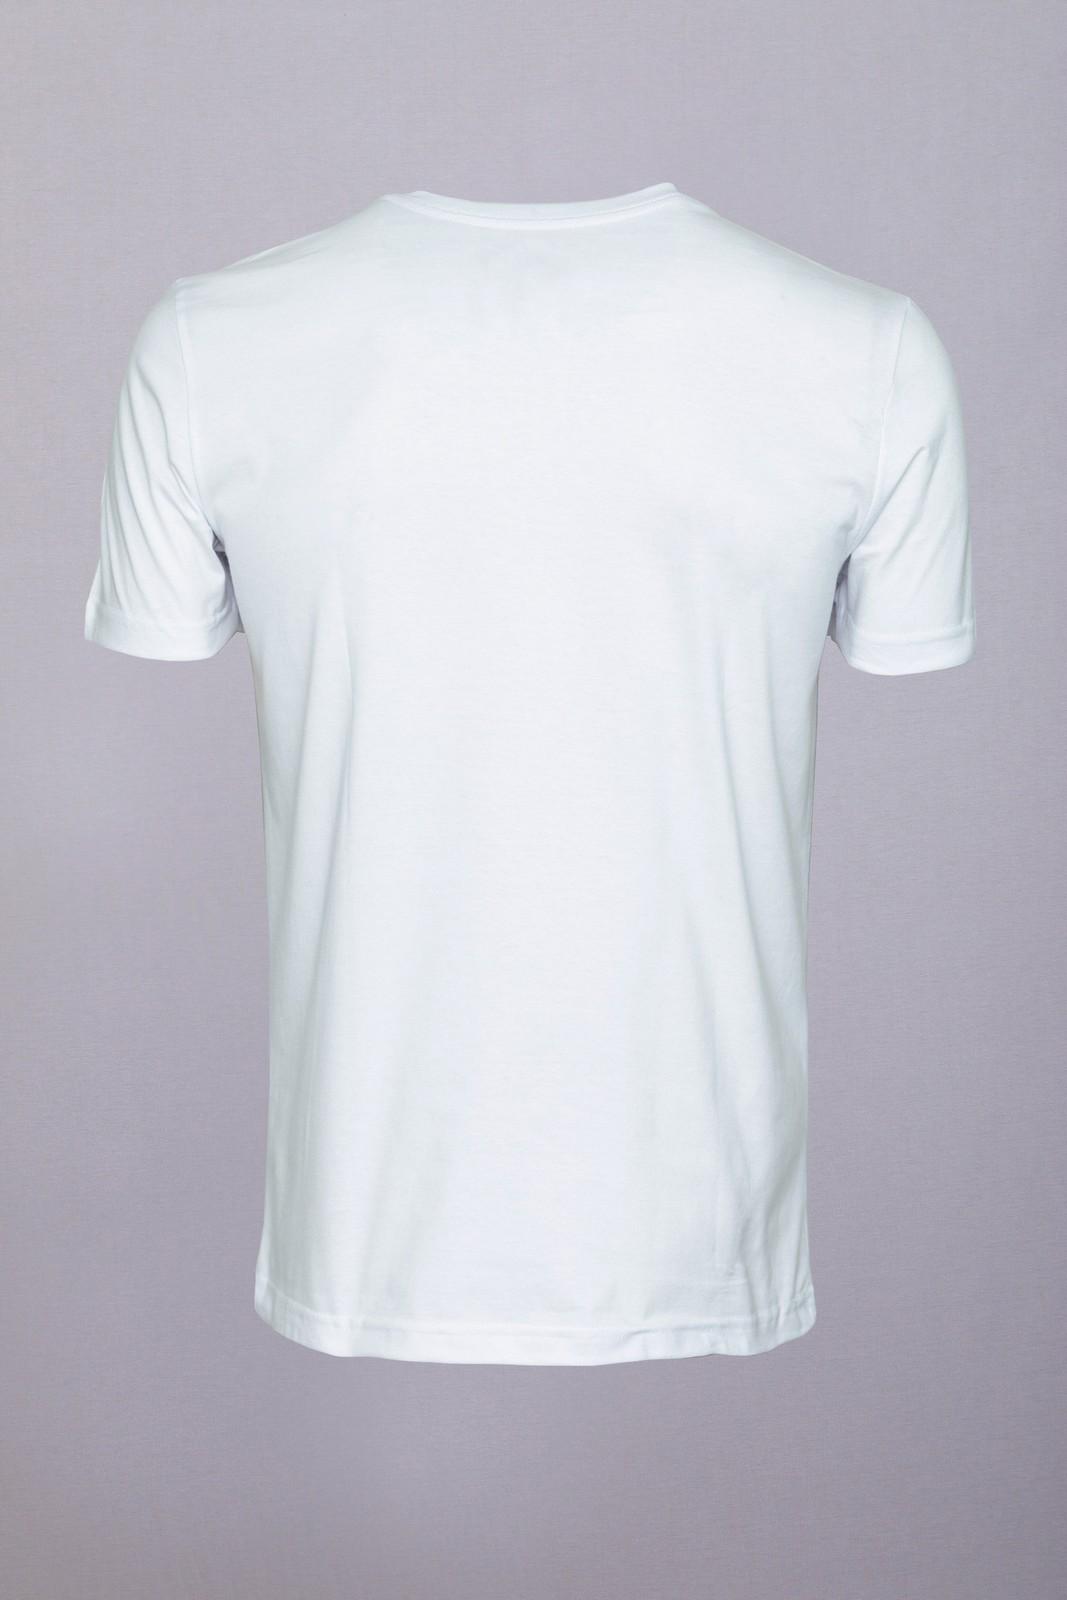 Camiseta CoolWave Black´s Beach.CA Branca